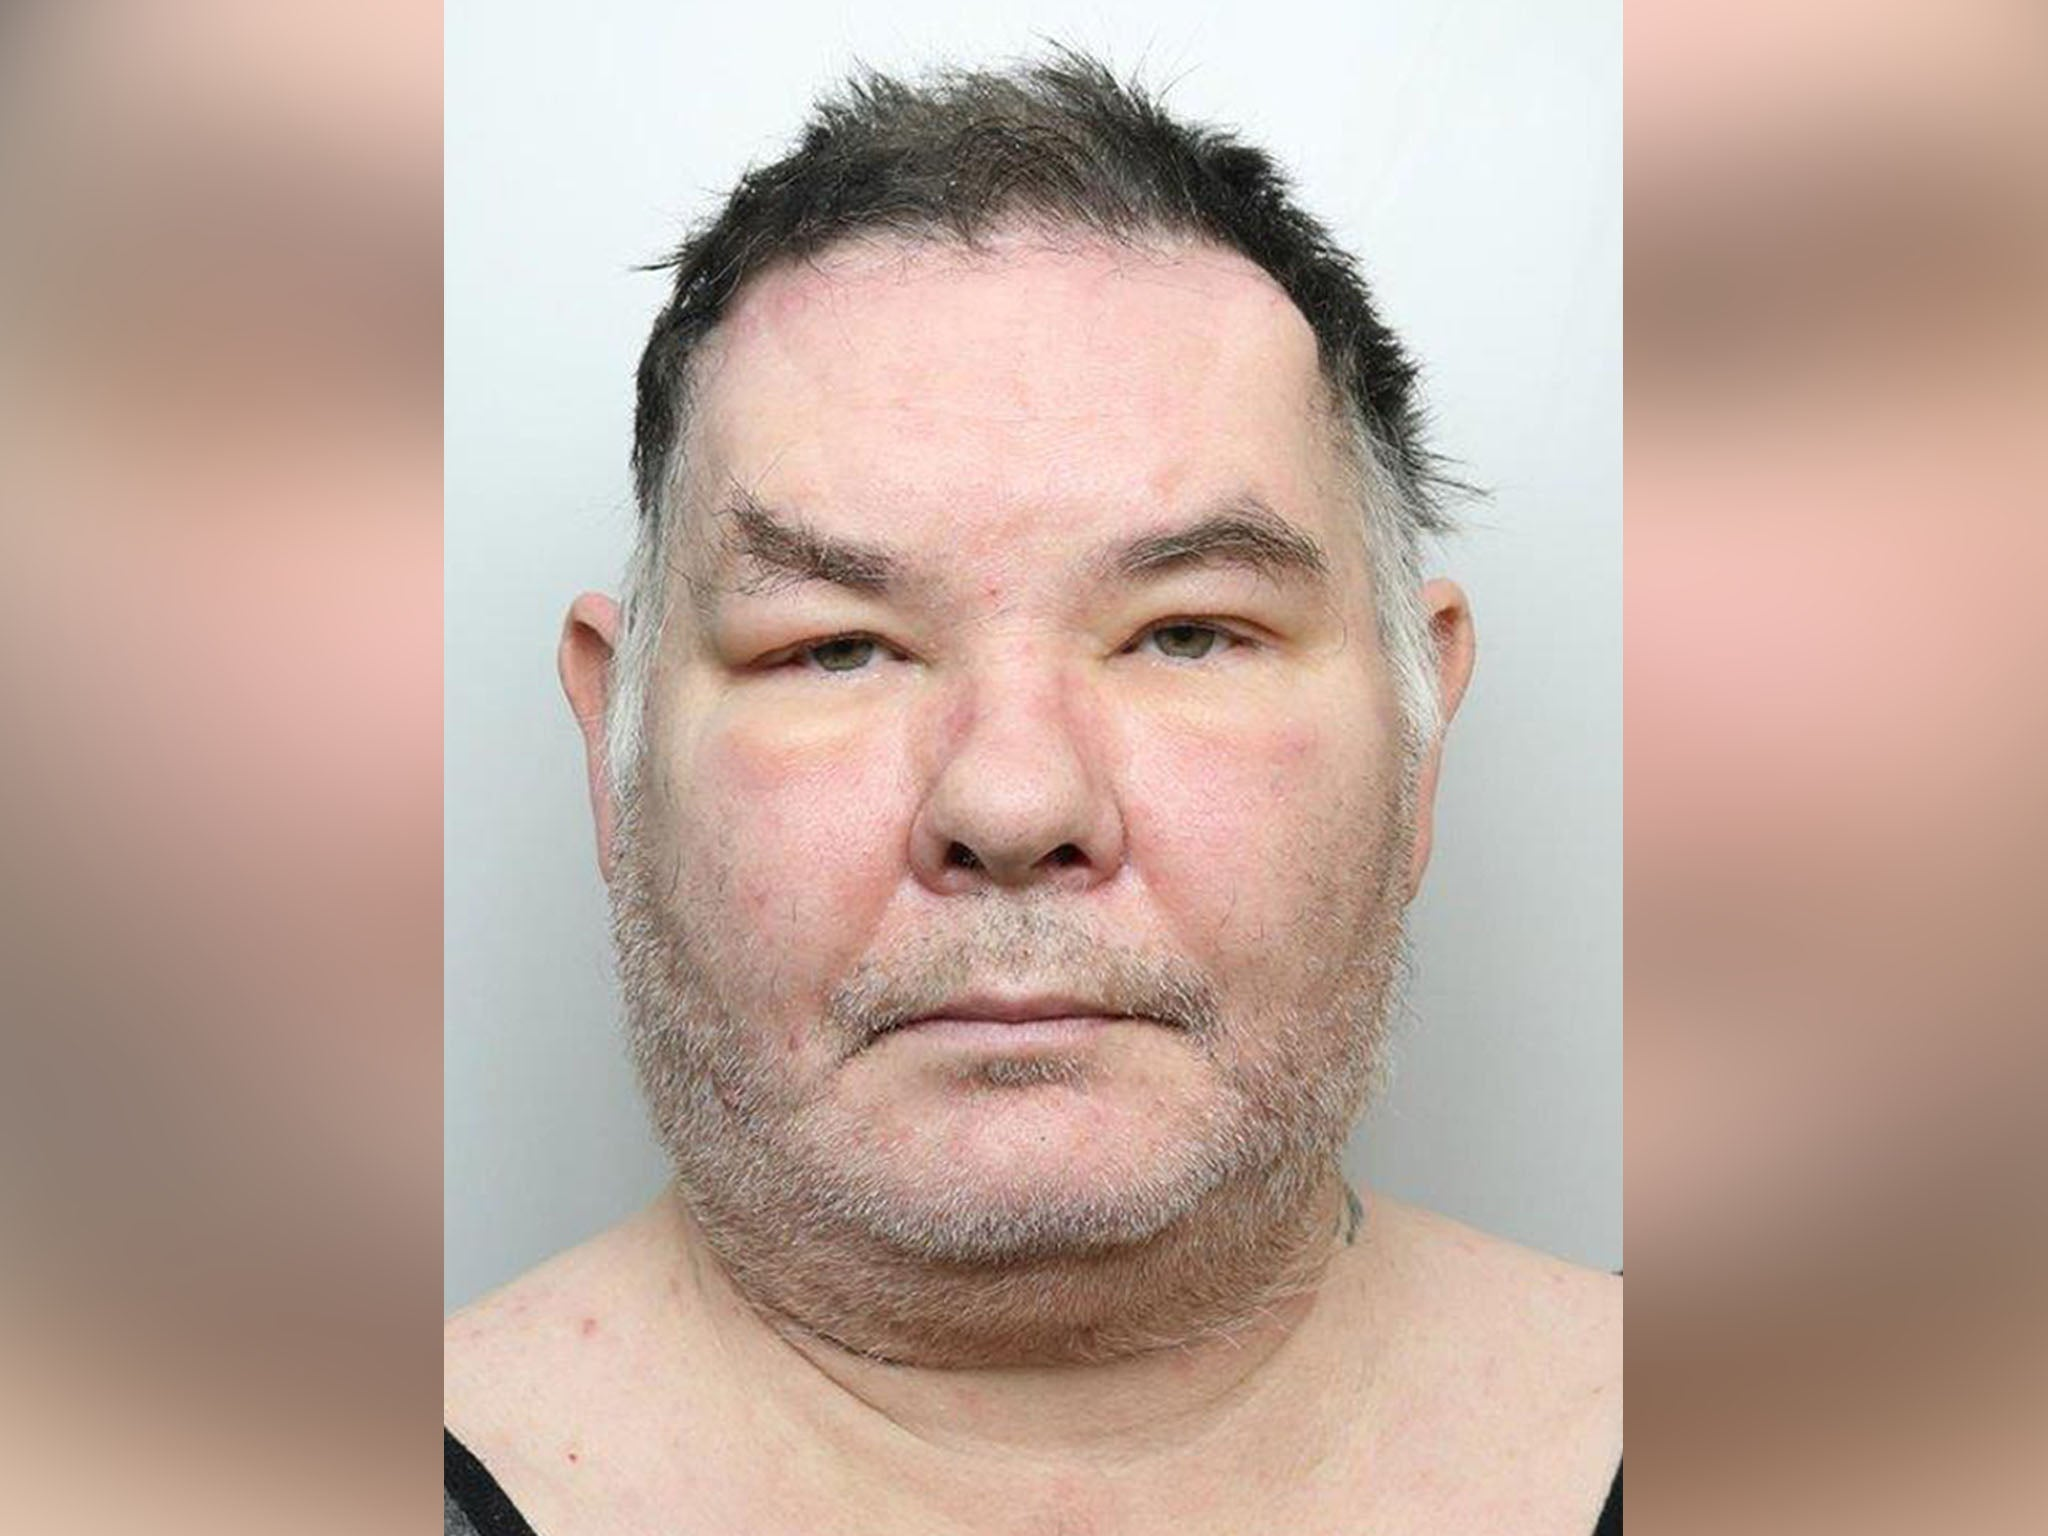 Karen White: Transgender prisoner jailed for life for sexually assaulting female inmates and raping two other women